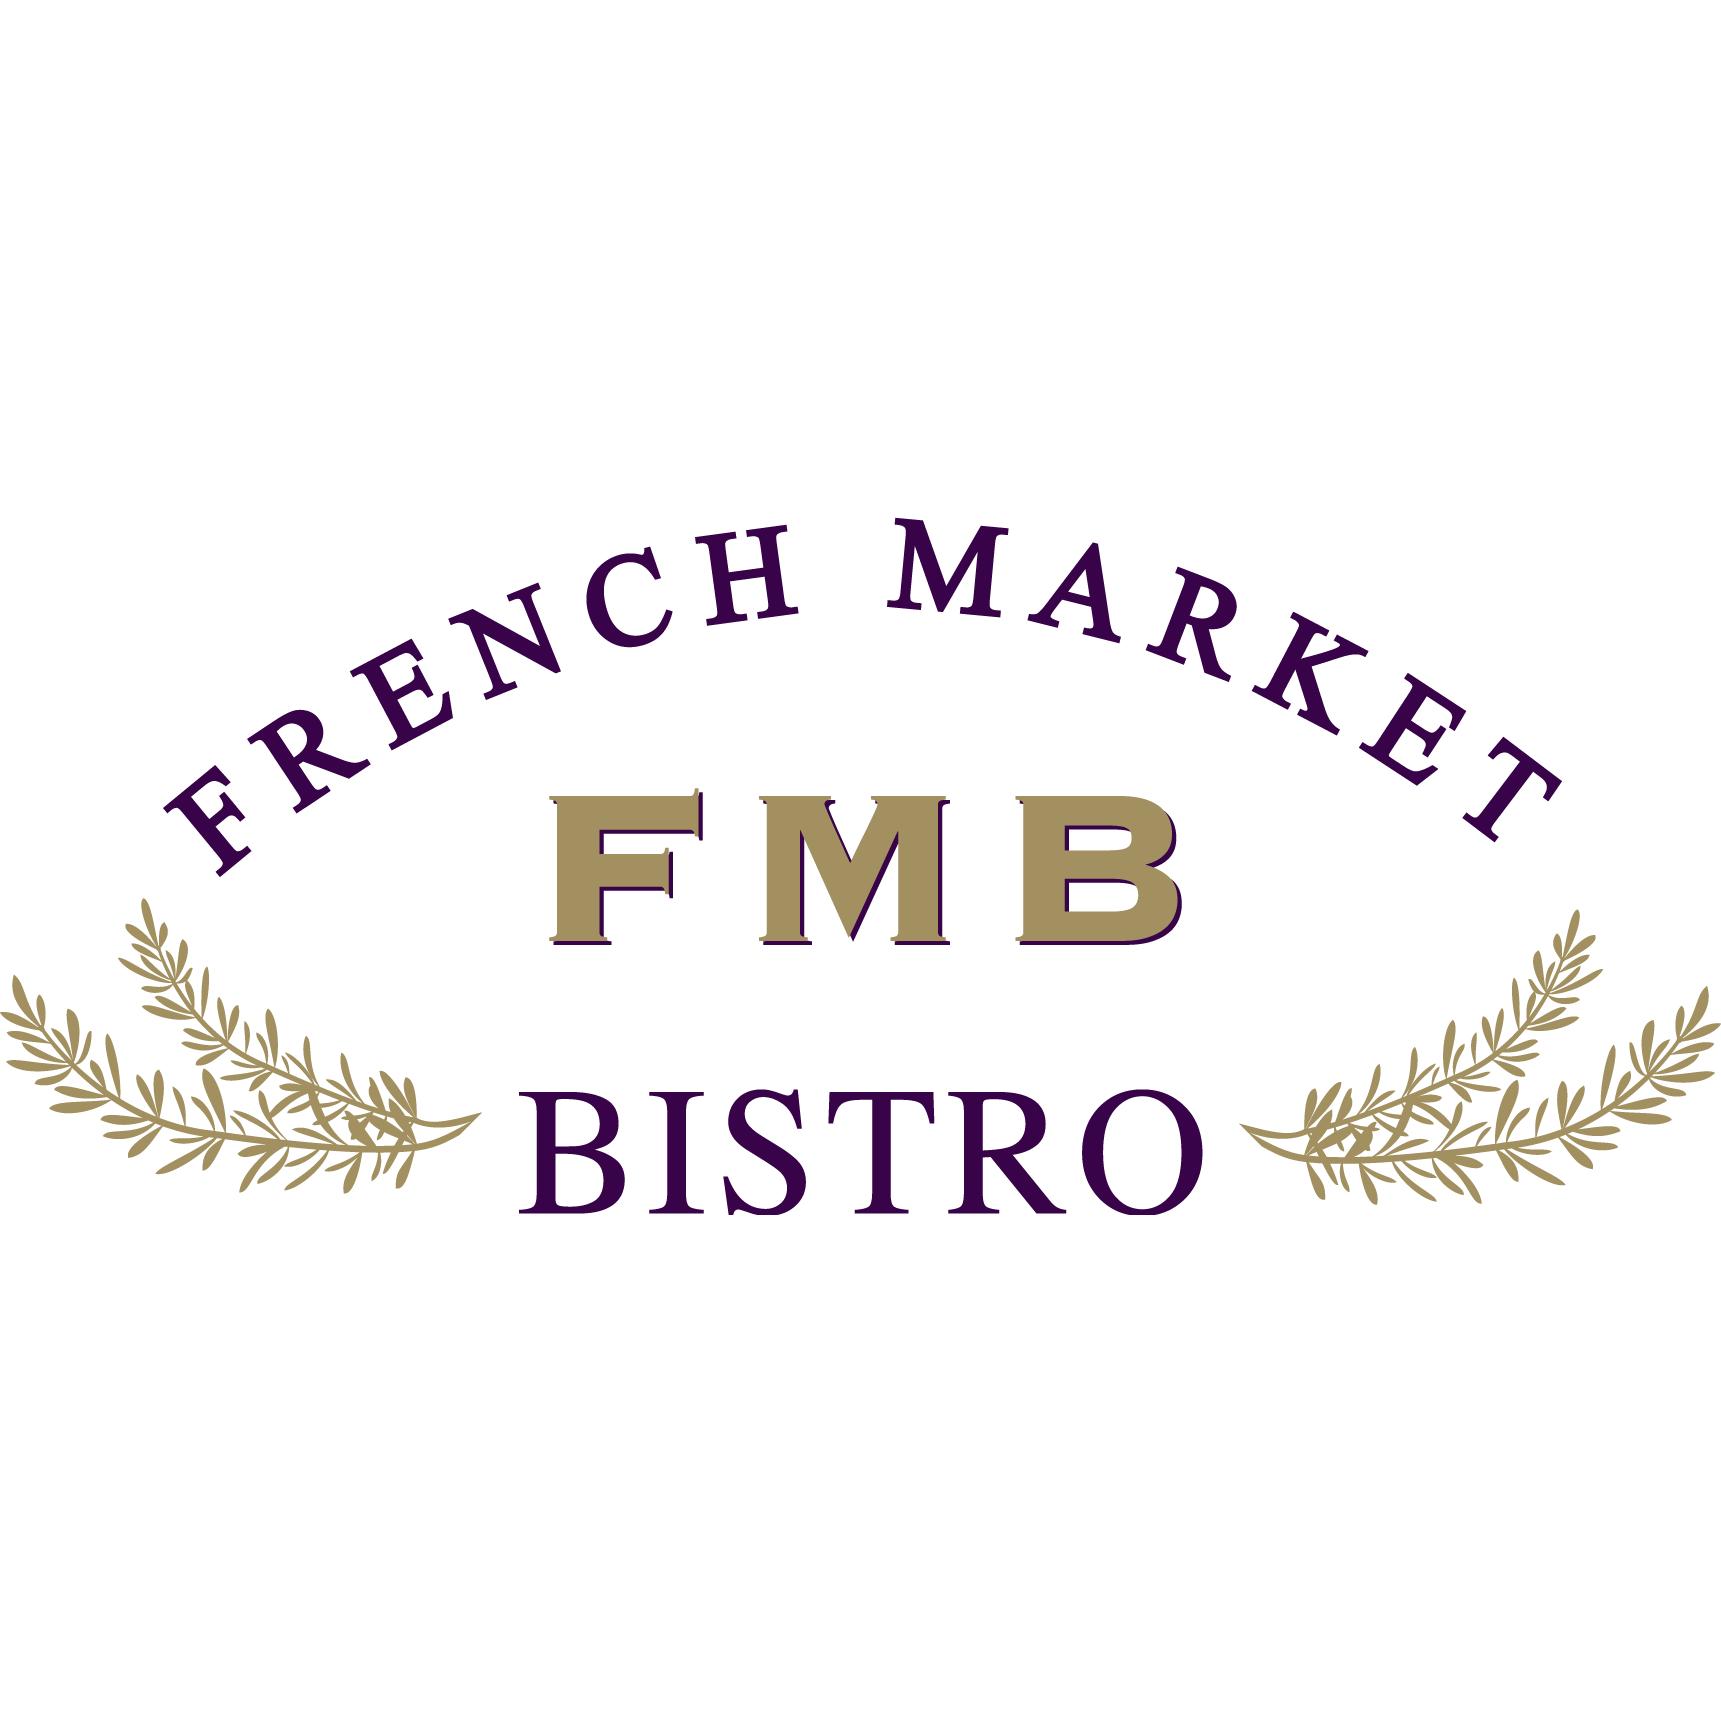 French Market Bistro - Baton Rouge, LA - Restaurants